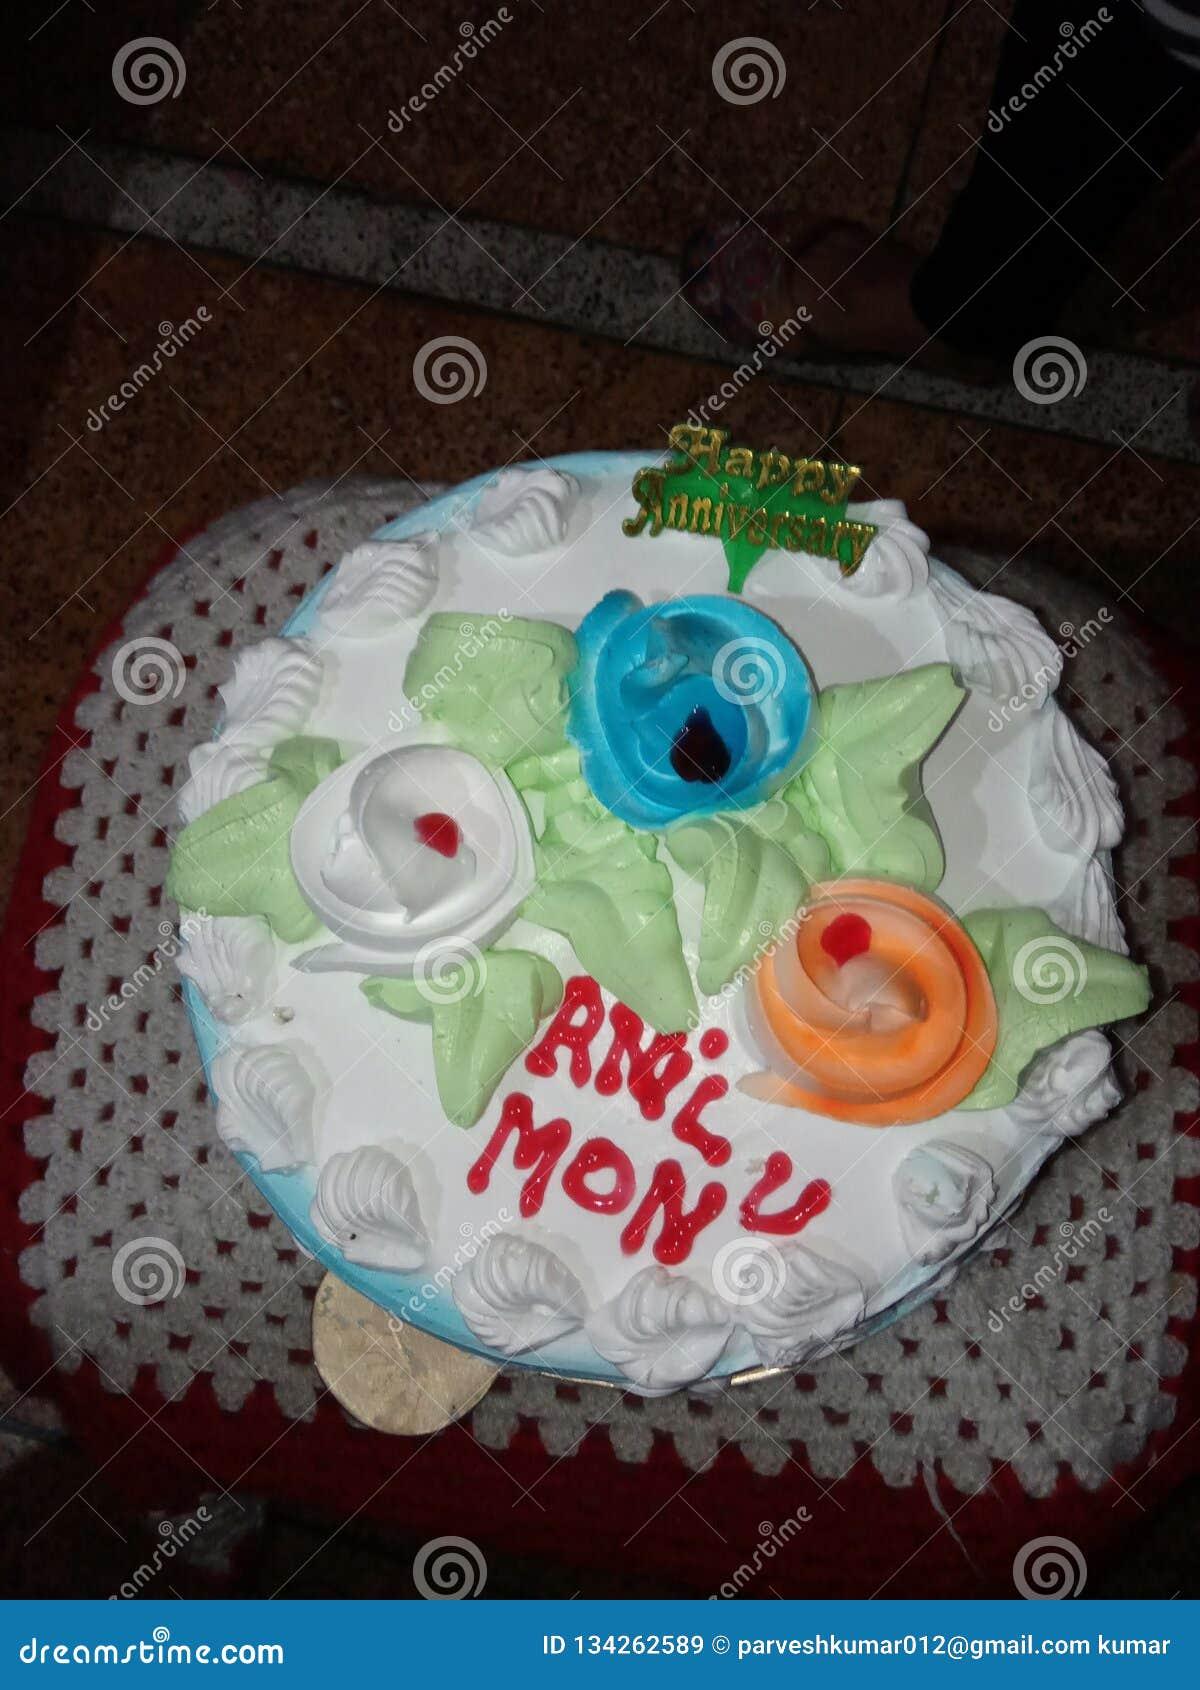 Cake Stock Image Image Of Happy Anniversary Cake 134262589